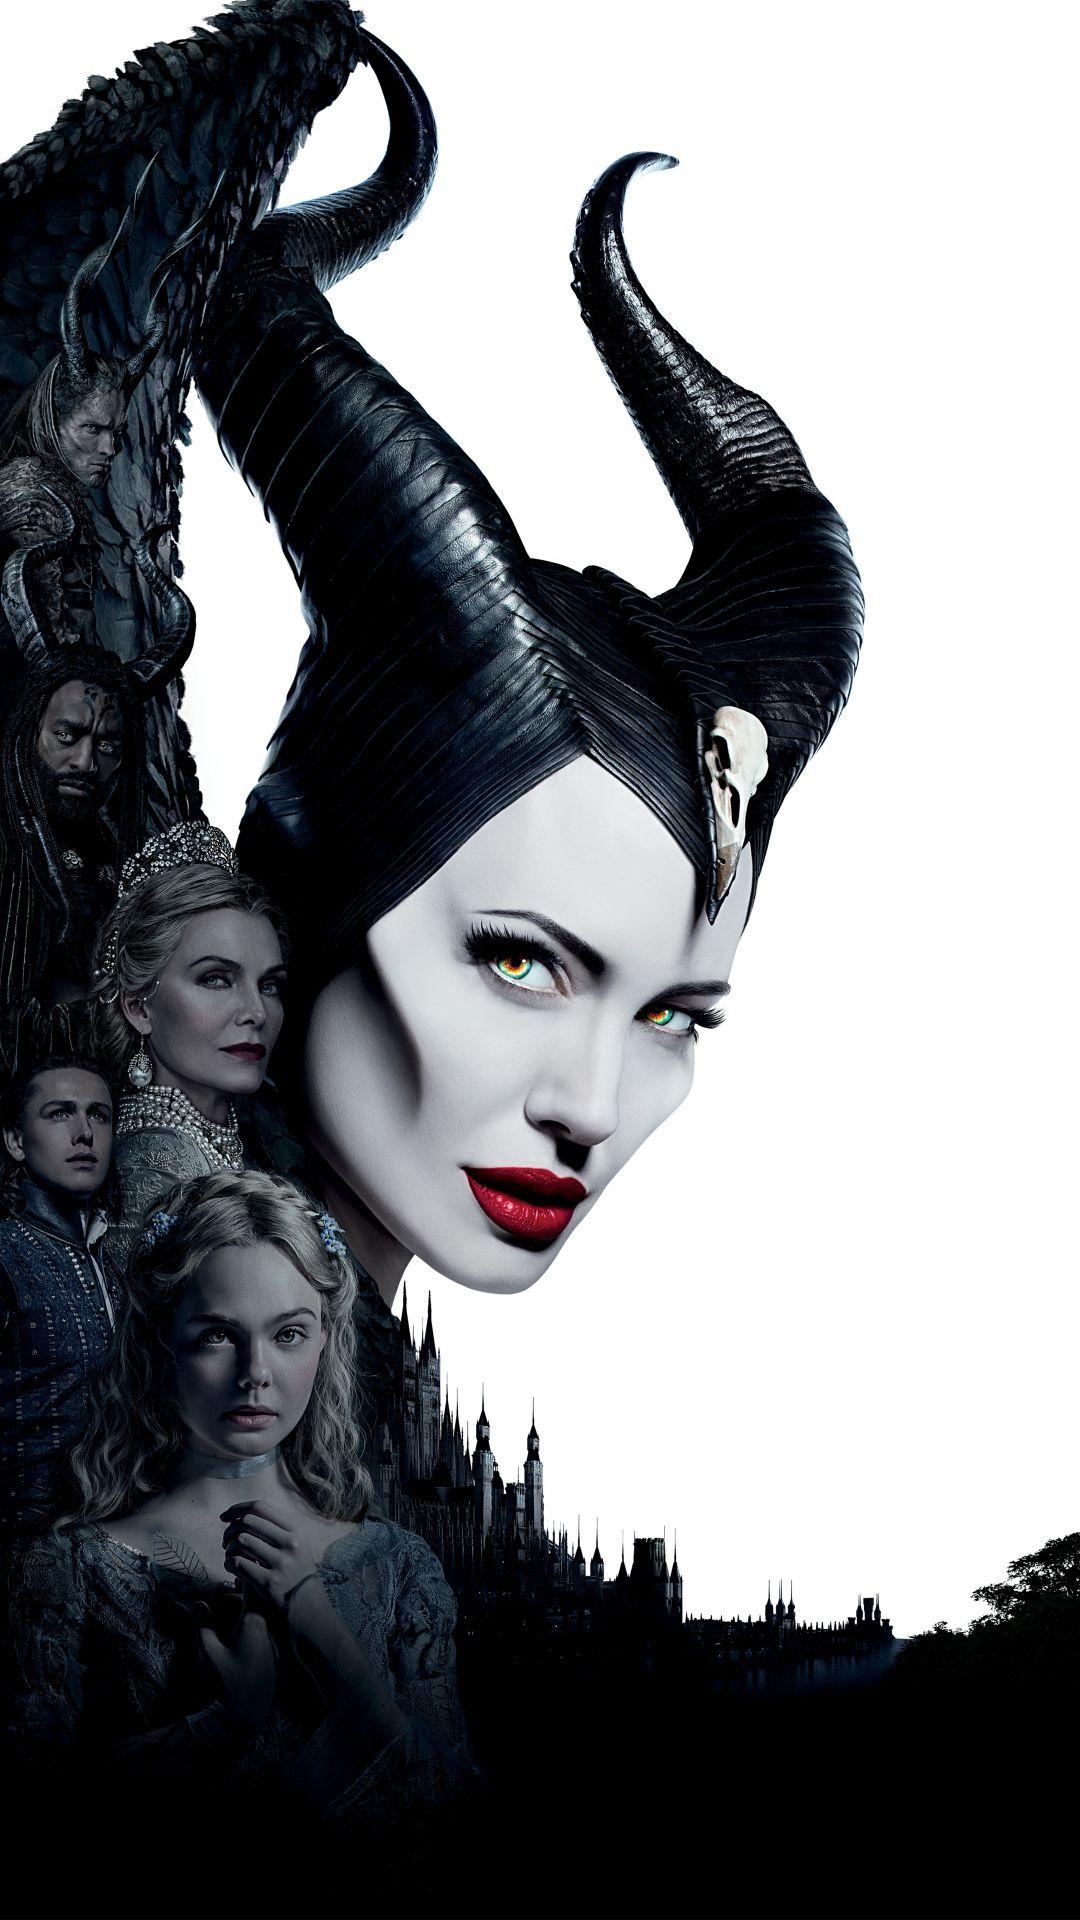 1080x1920 Maleficent Mistress Of Evil Witch Movie 2019 Wallpaper Watch Maleficent Maleficent Movie Maleficent 2